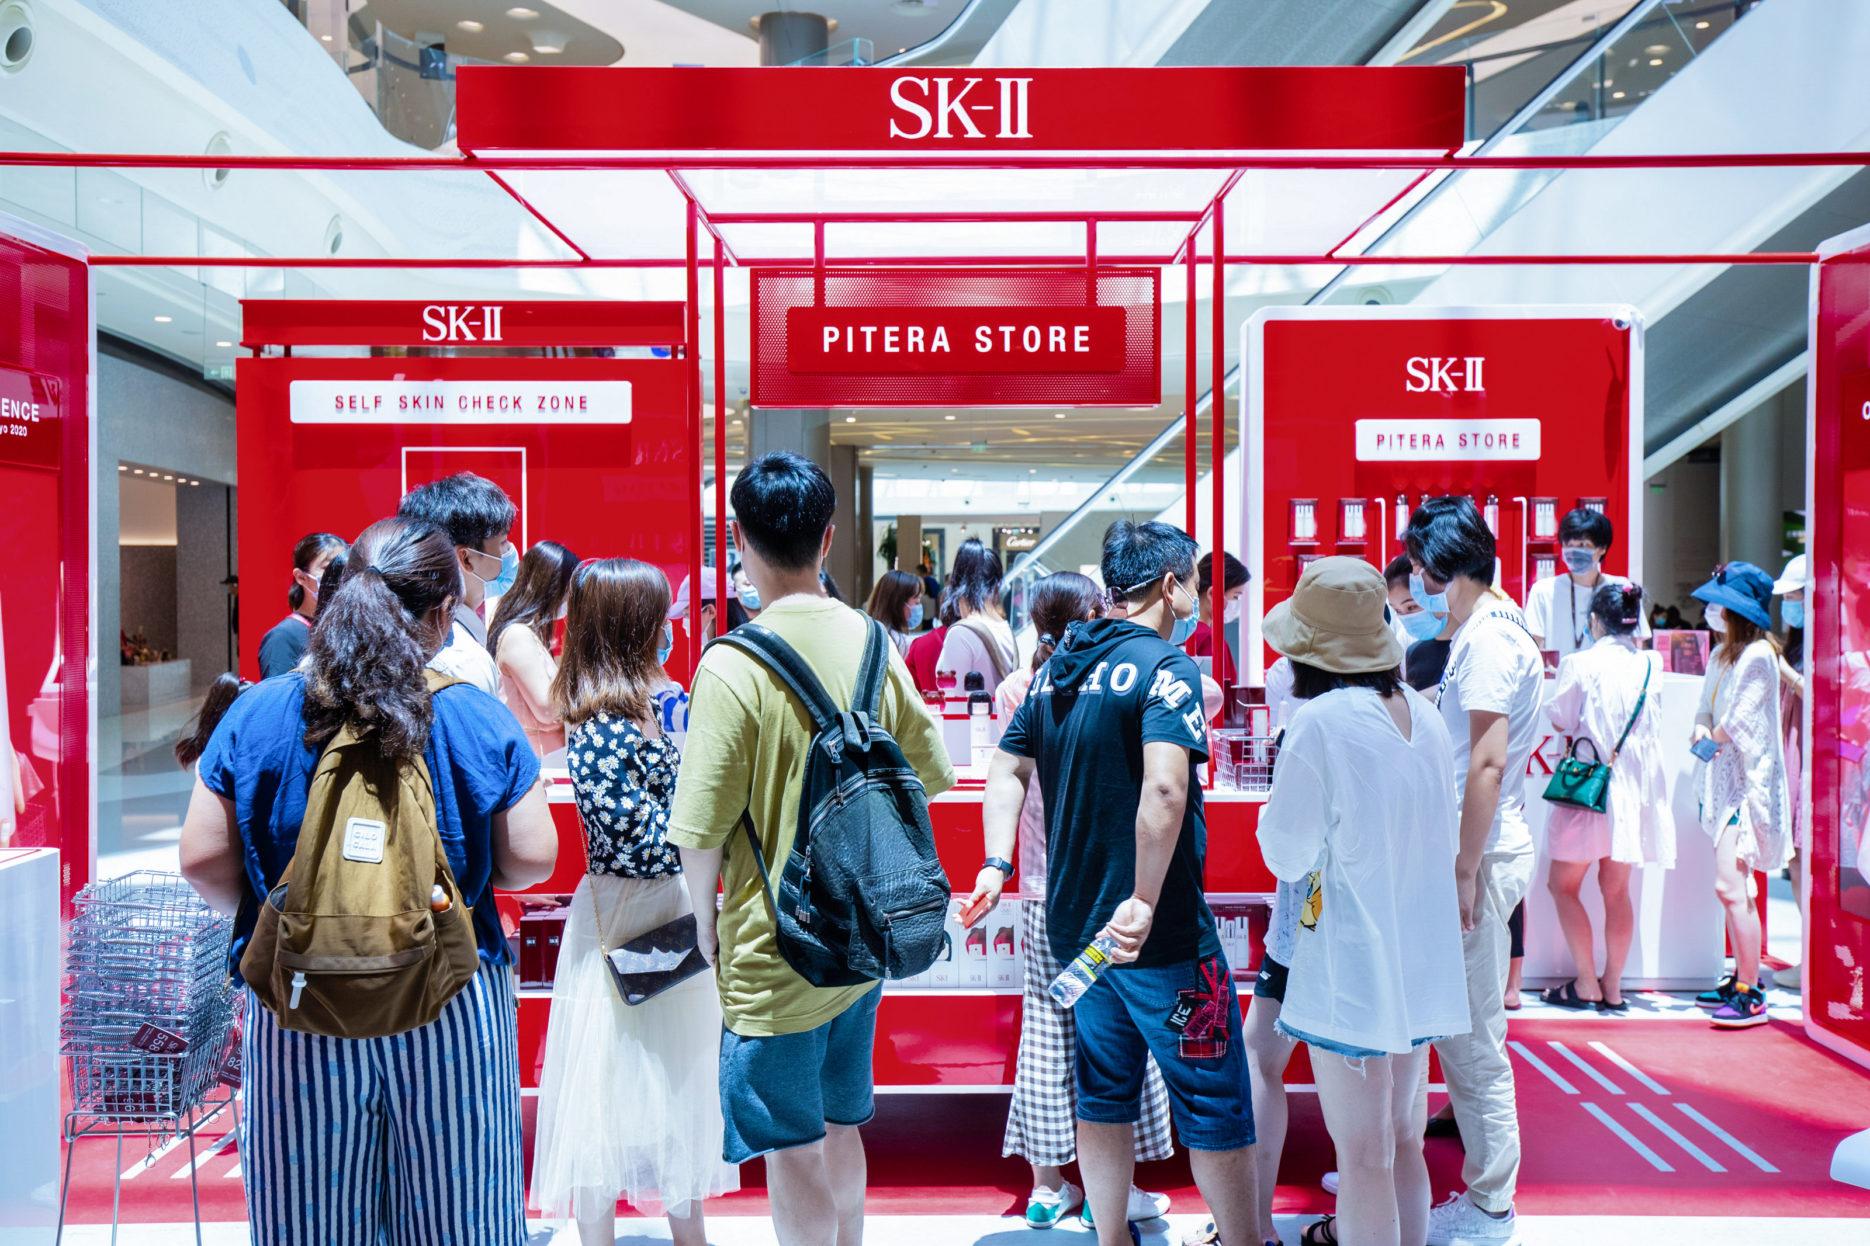 Sk-II new social retail store in Hainan. Credit: Jiemian